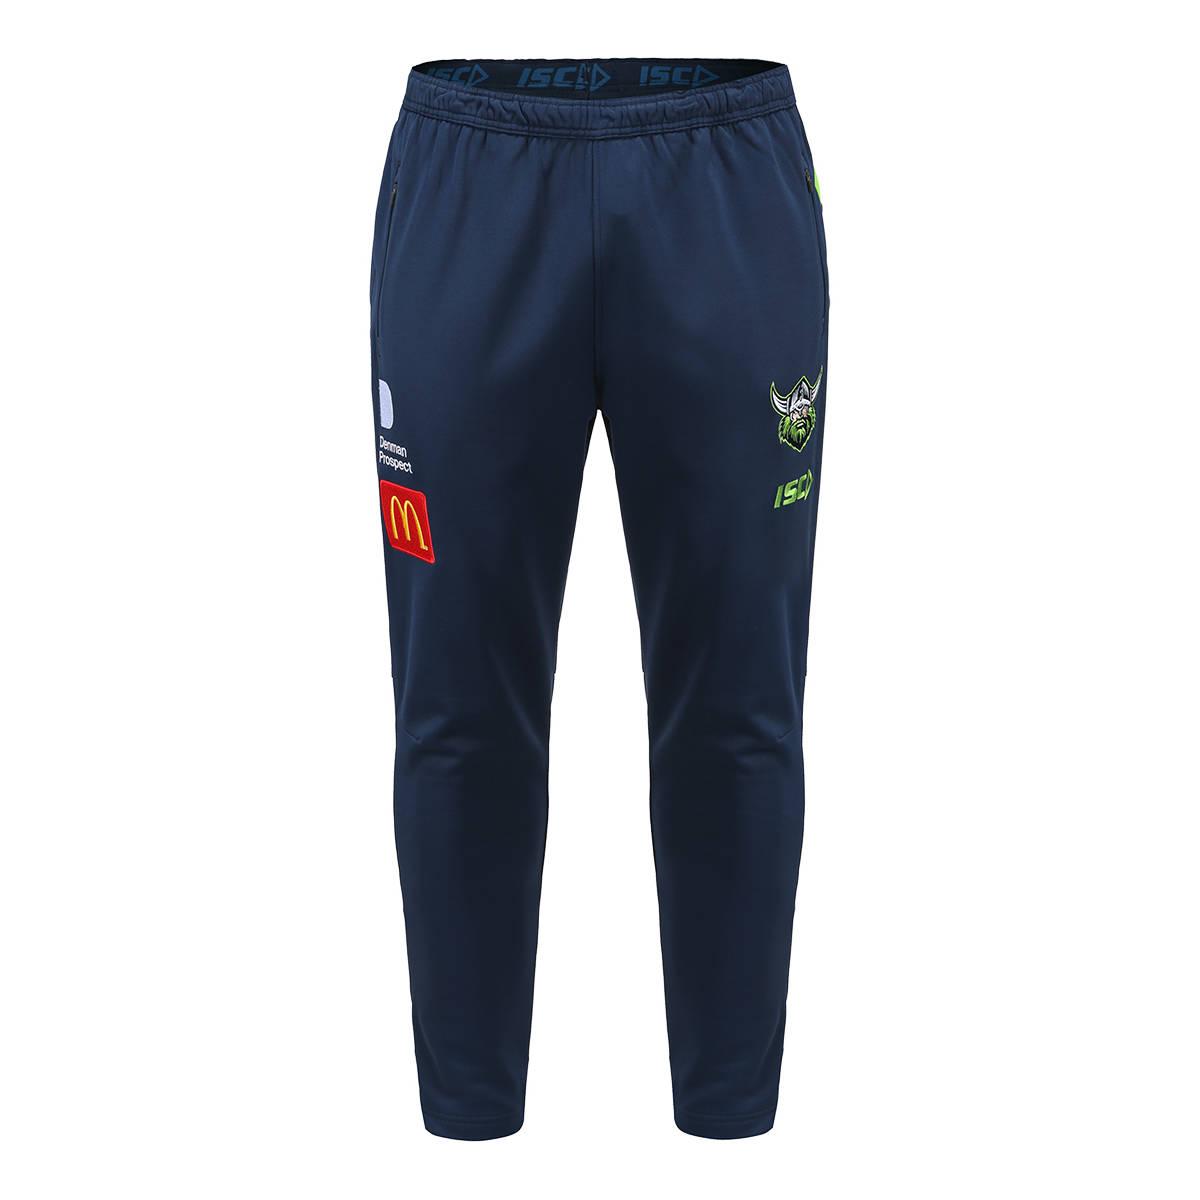 2021 Players Track Pants0